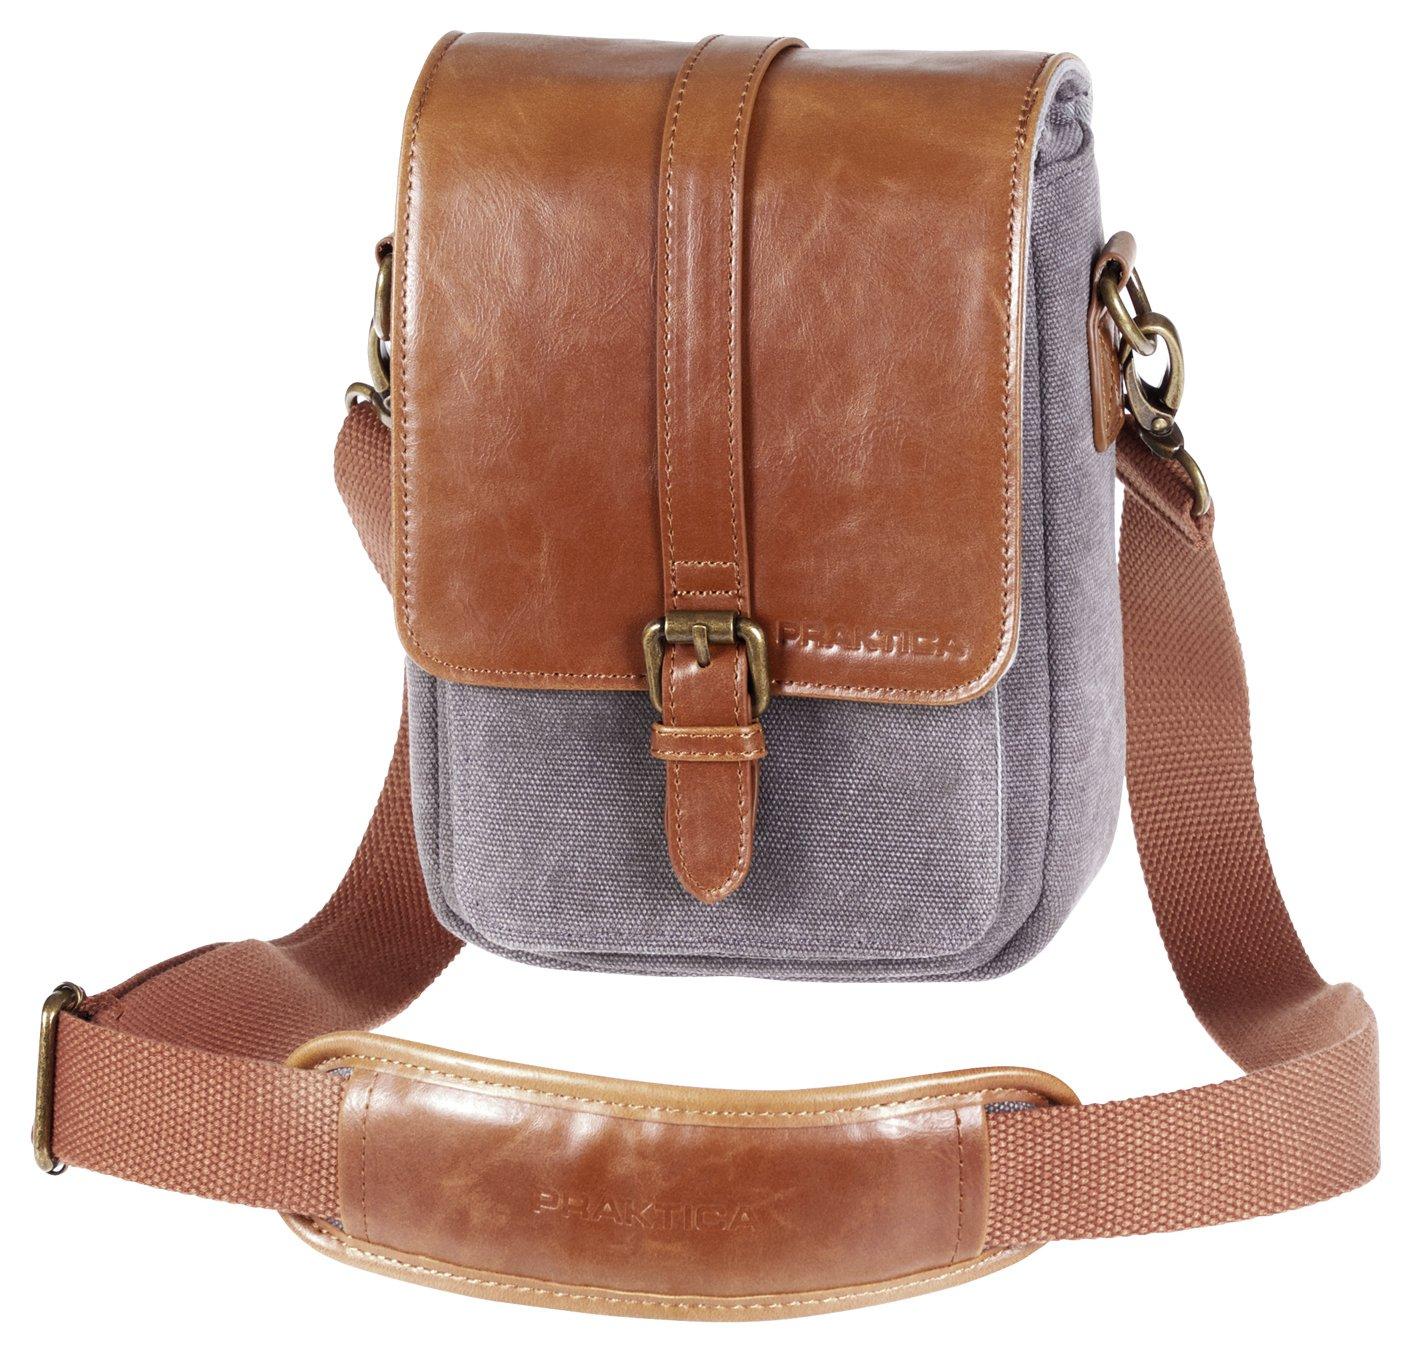 Praktica Heritage Binocular Case Bag